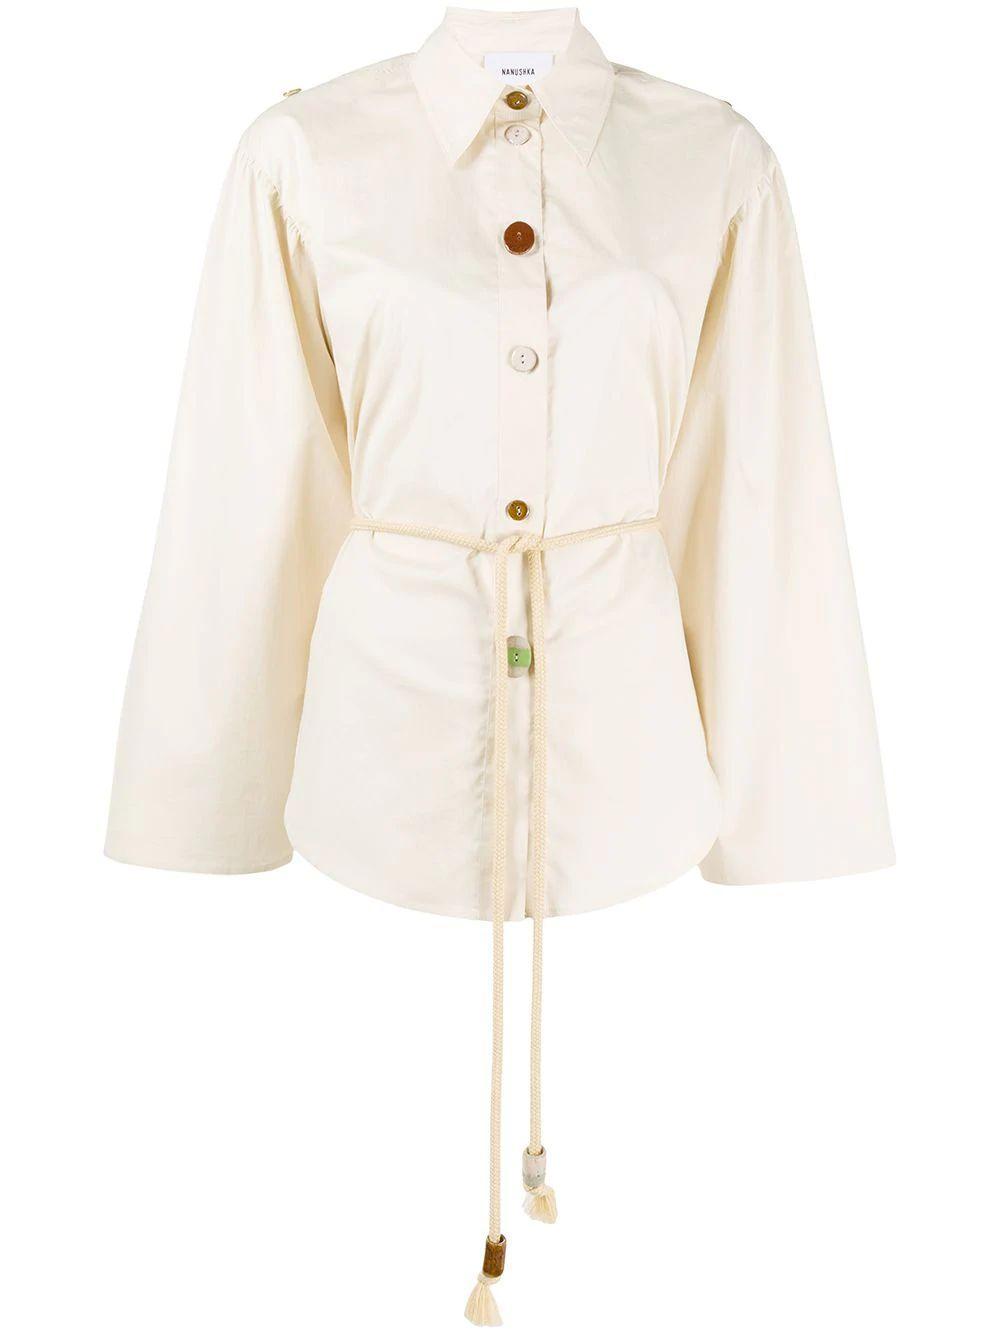 Tammi Oversized Wooden Button Top Item # WSB00140